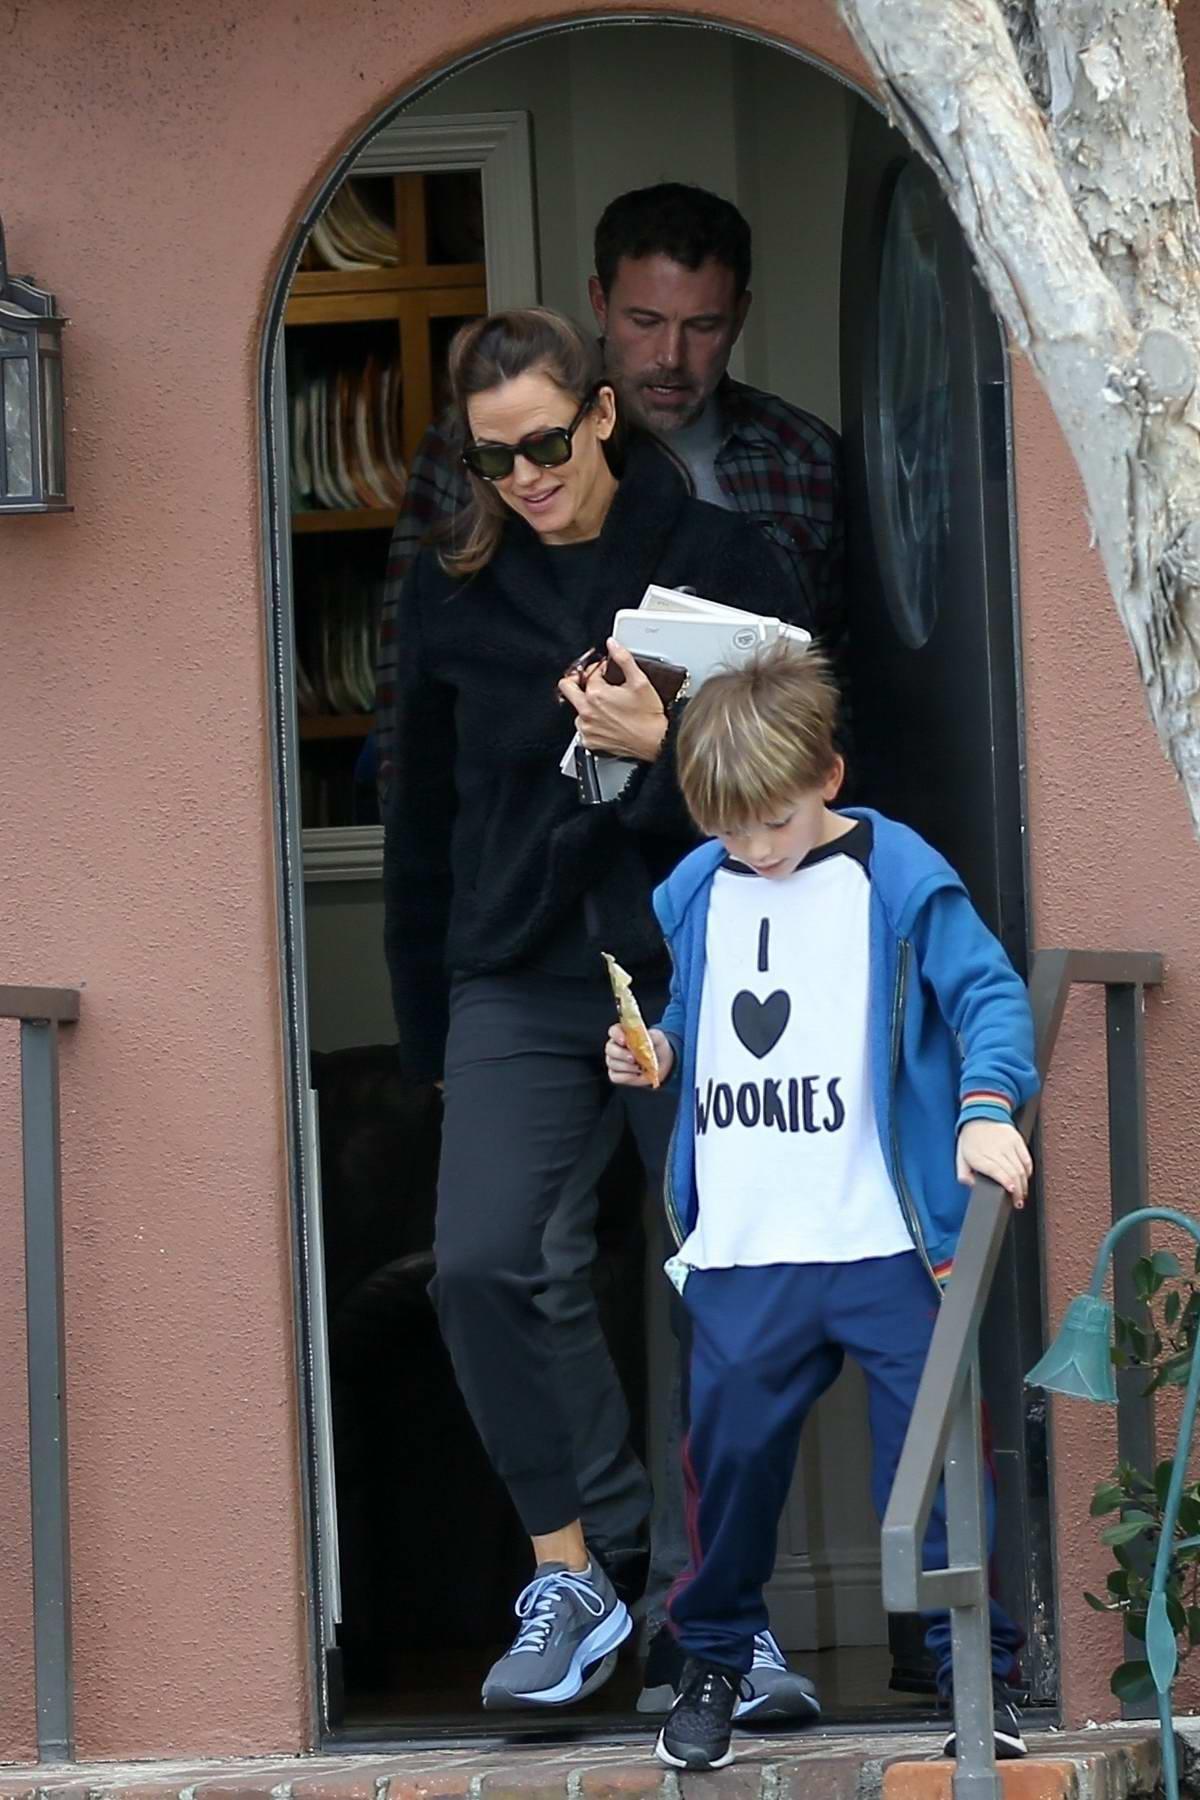 Jennifer Garner and Ben Affleck take their son Samuel to an appointment in Santa Monica, California